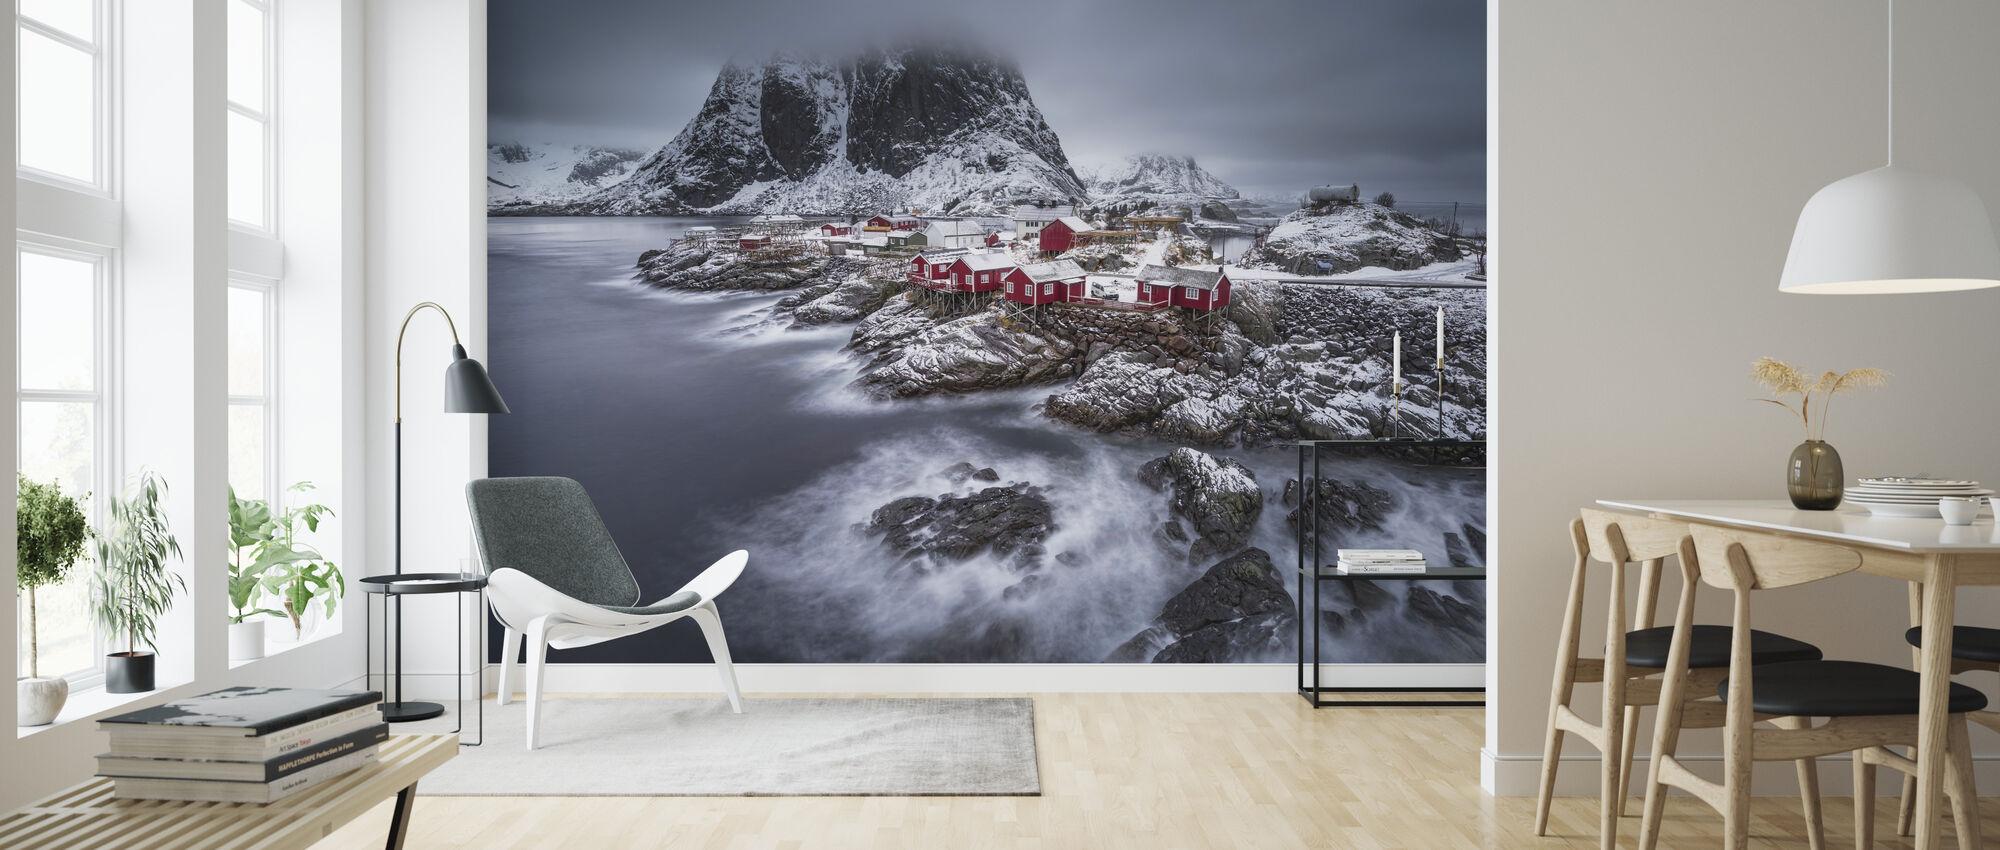 Winter Lofoten Islands - Tapet - Stue